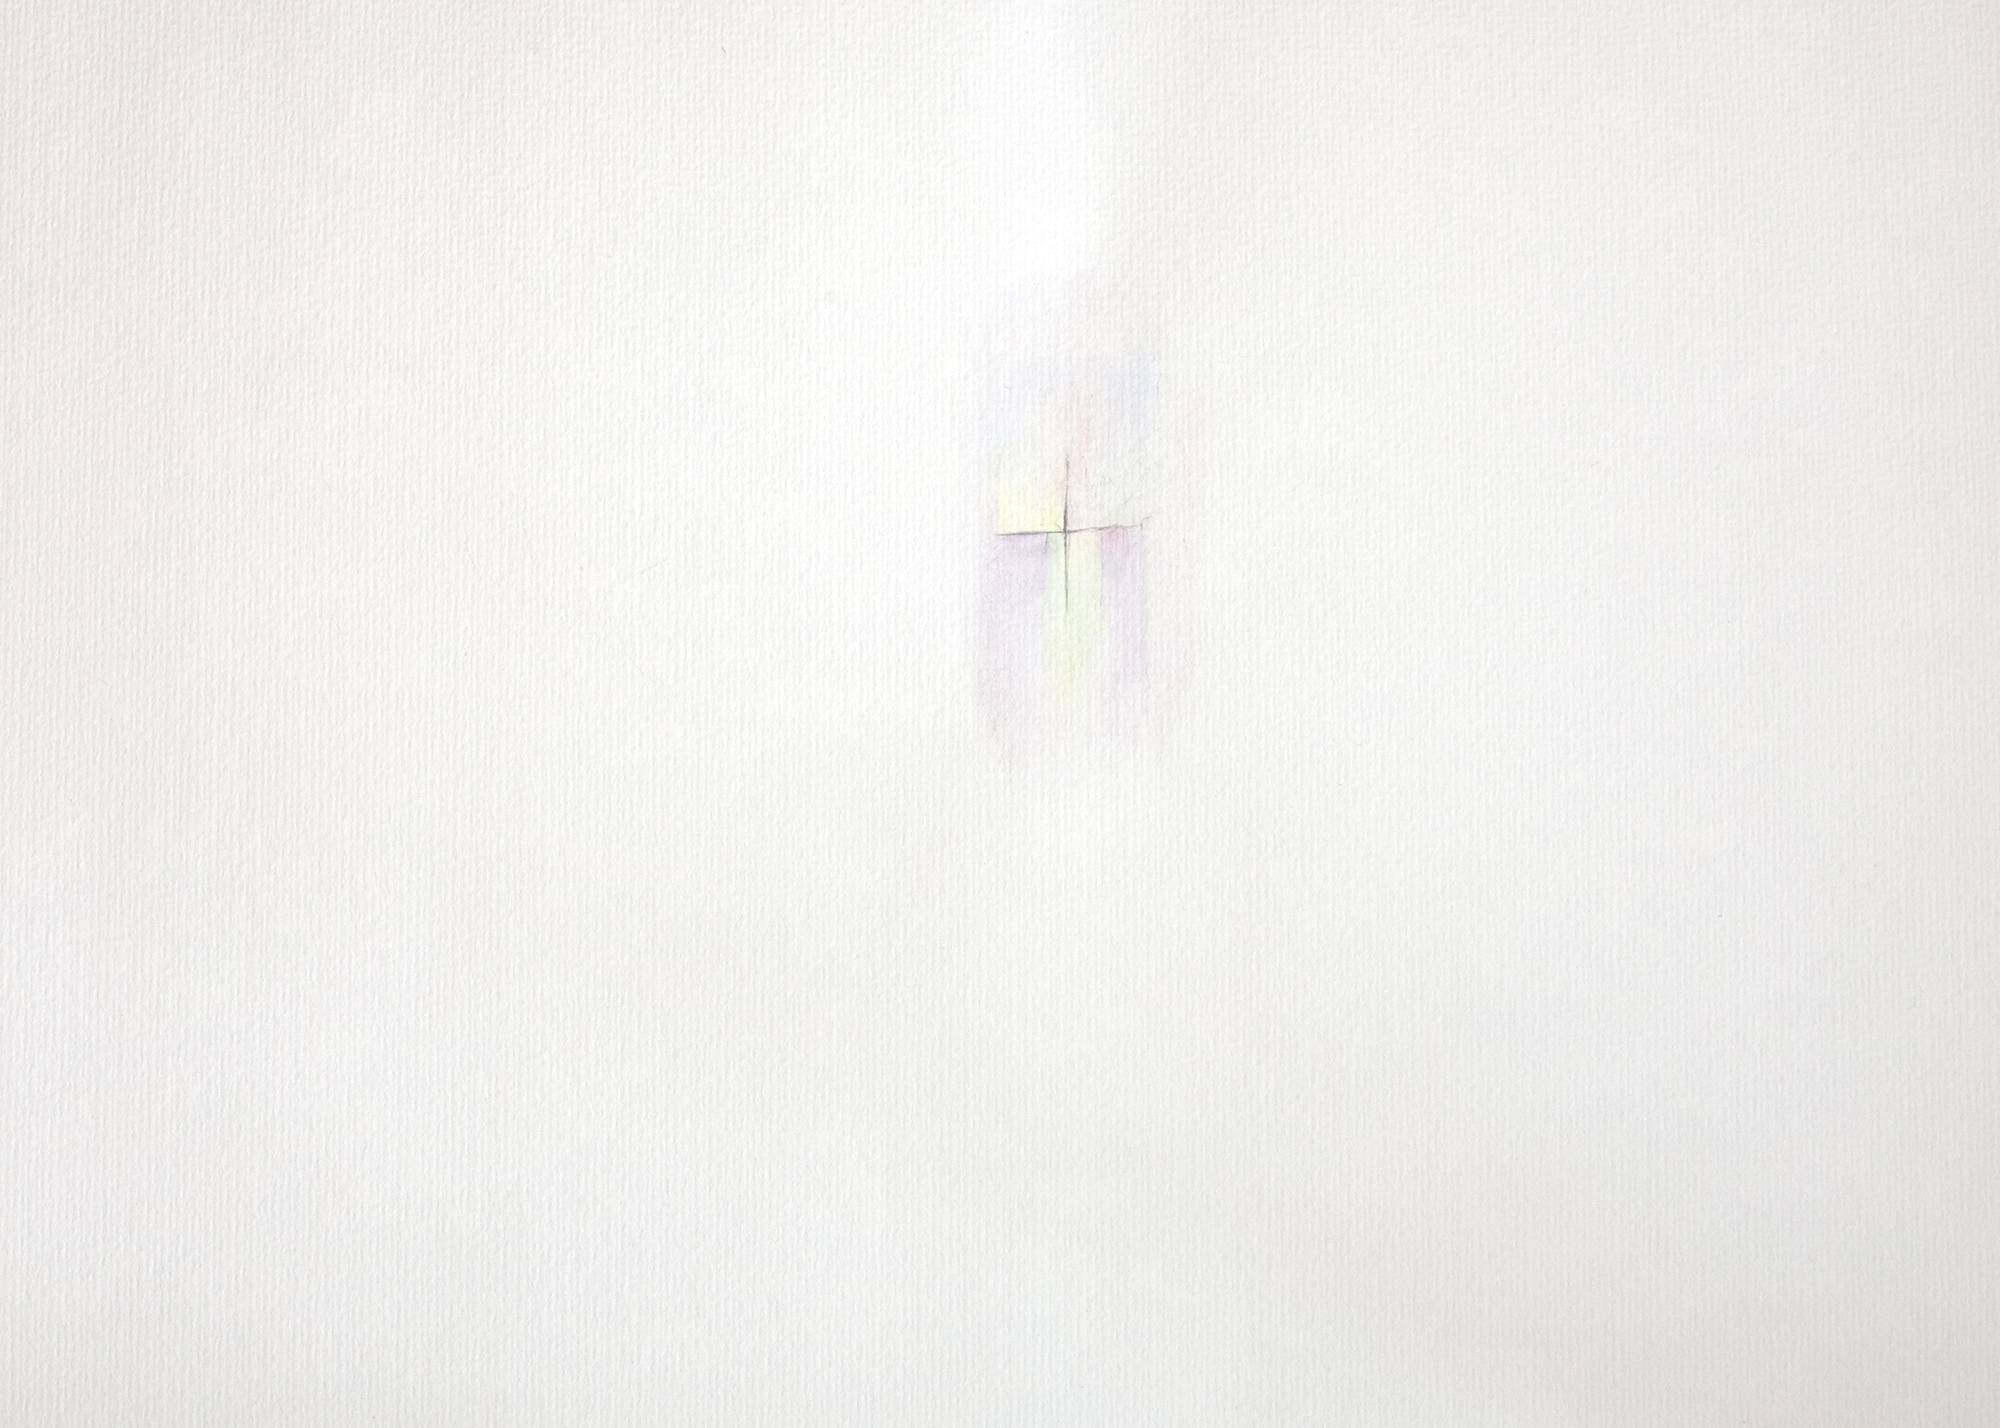 Untitled, 2006, color pencil on paper, 30 x 42 cm